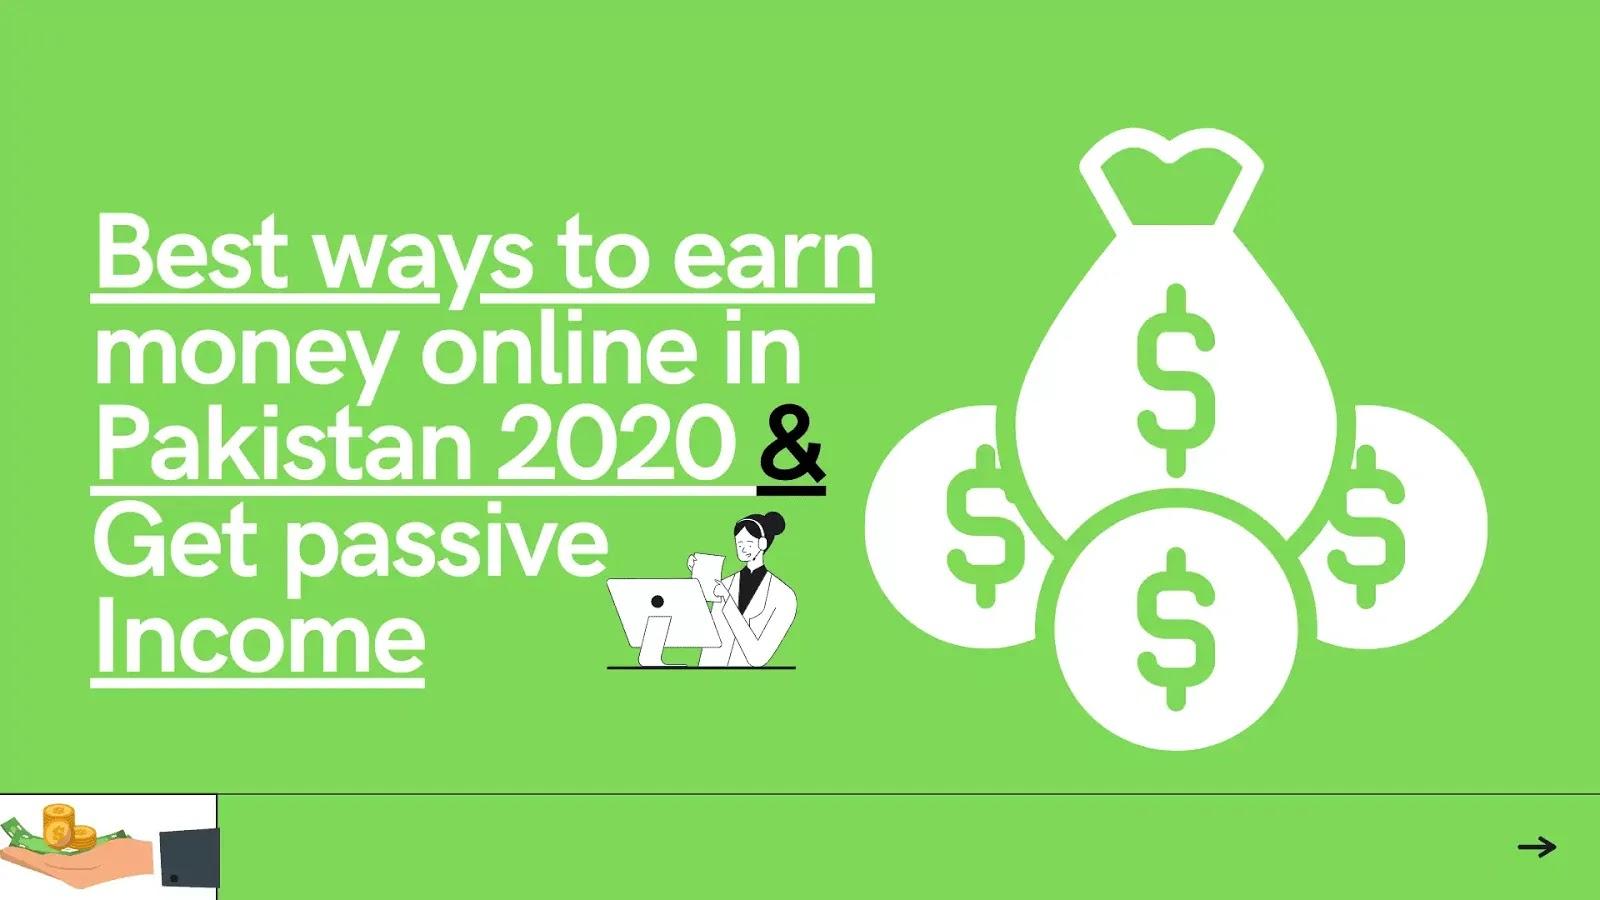 Best ways to earn money online in Pakistan 2020